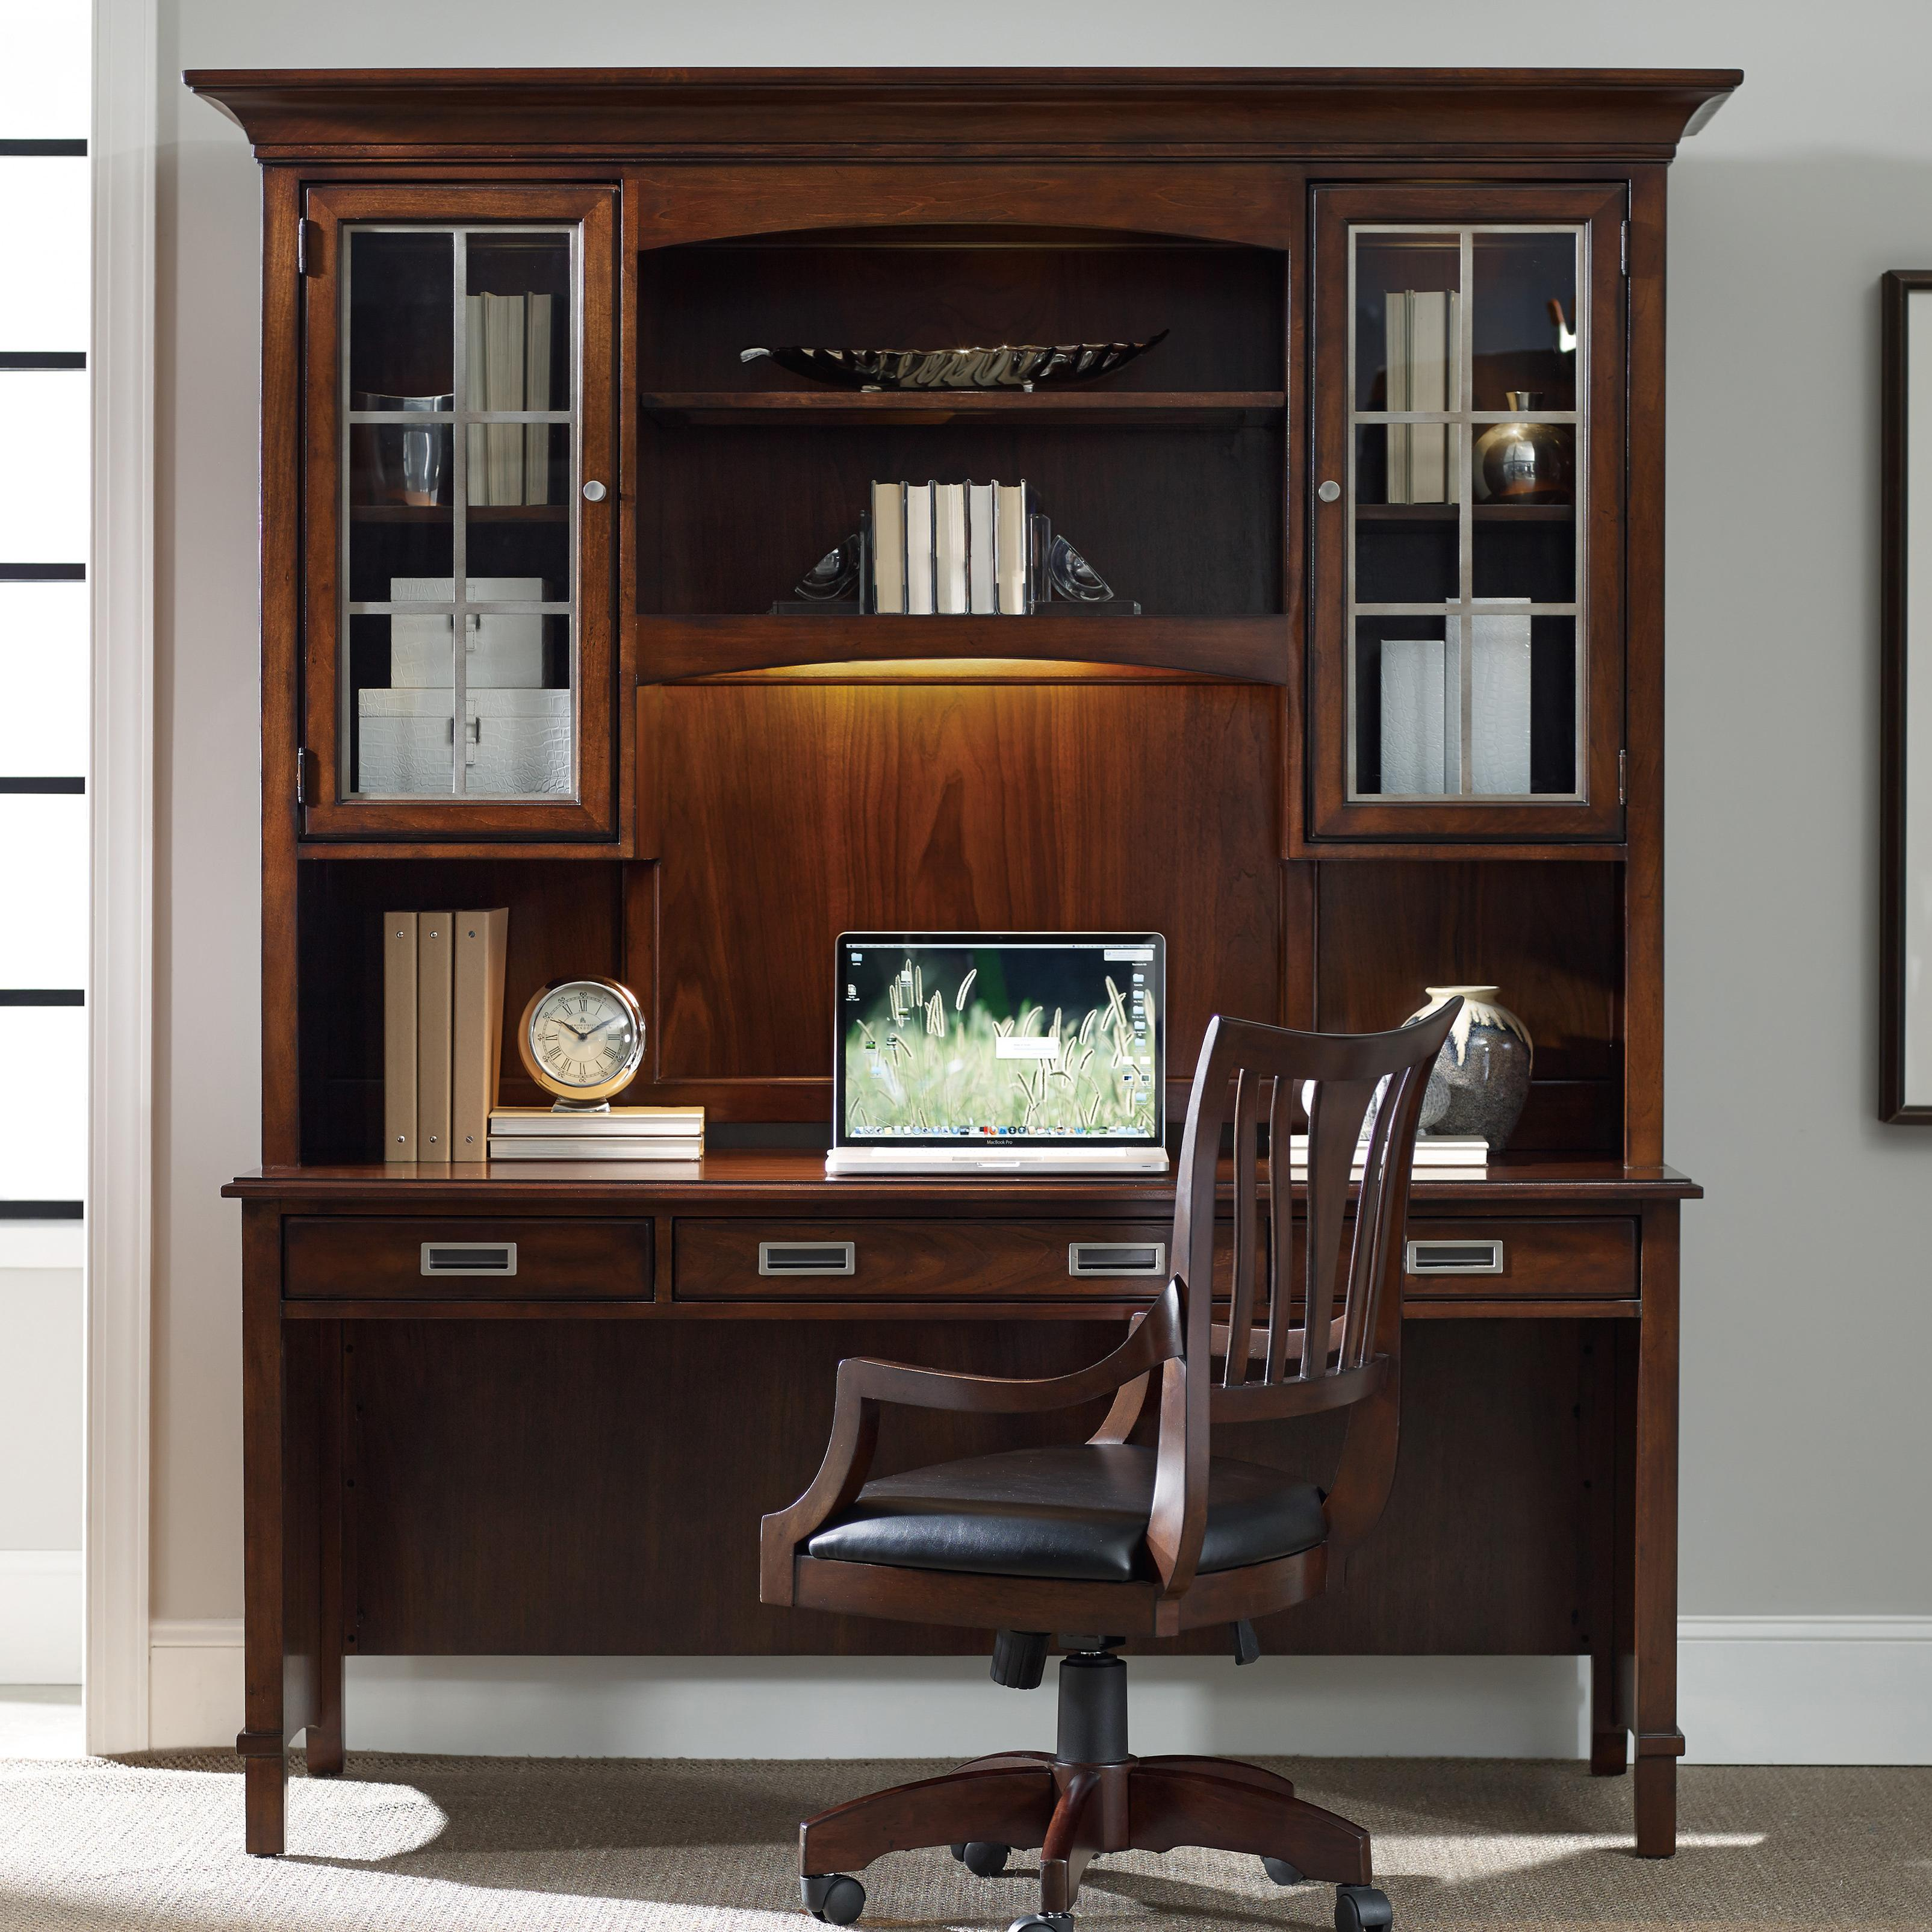 design desks previous desk by next market adnet of vintage set jacques